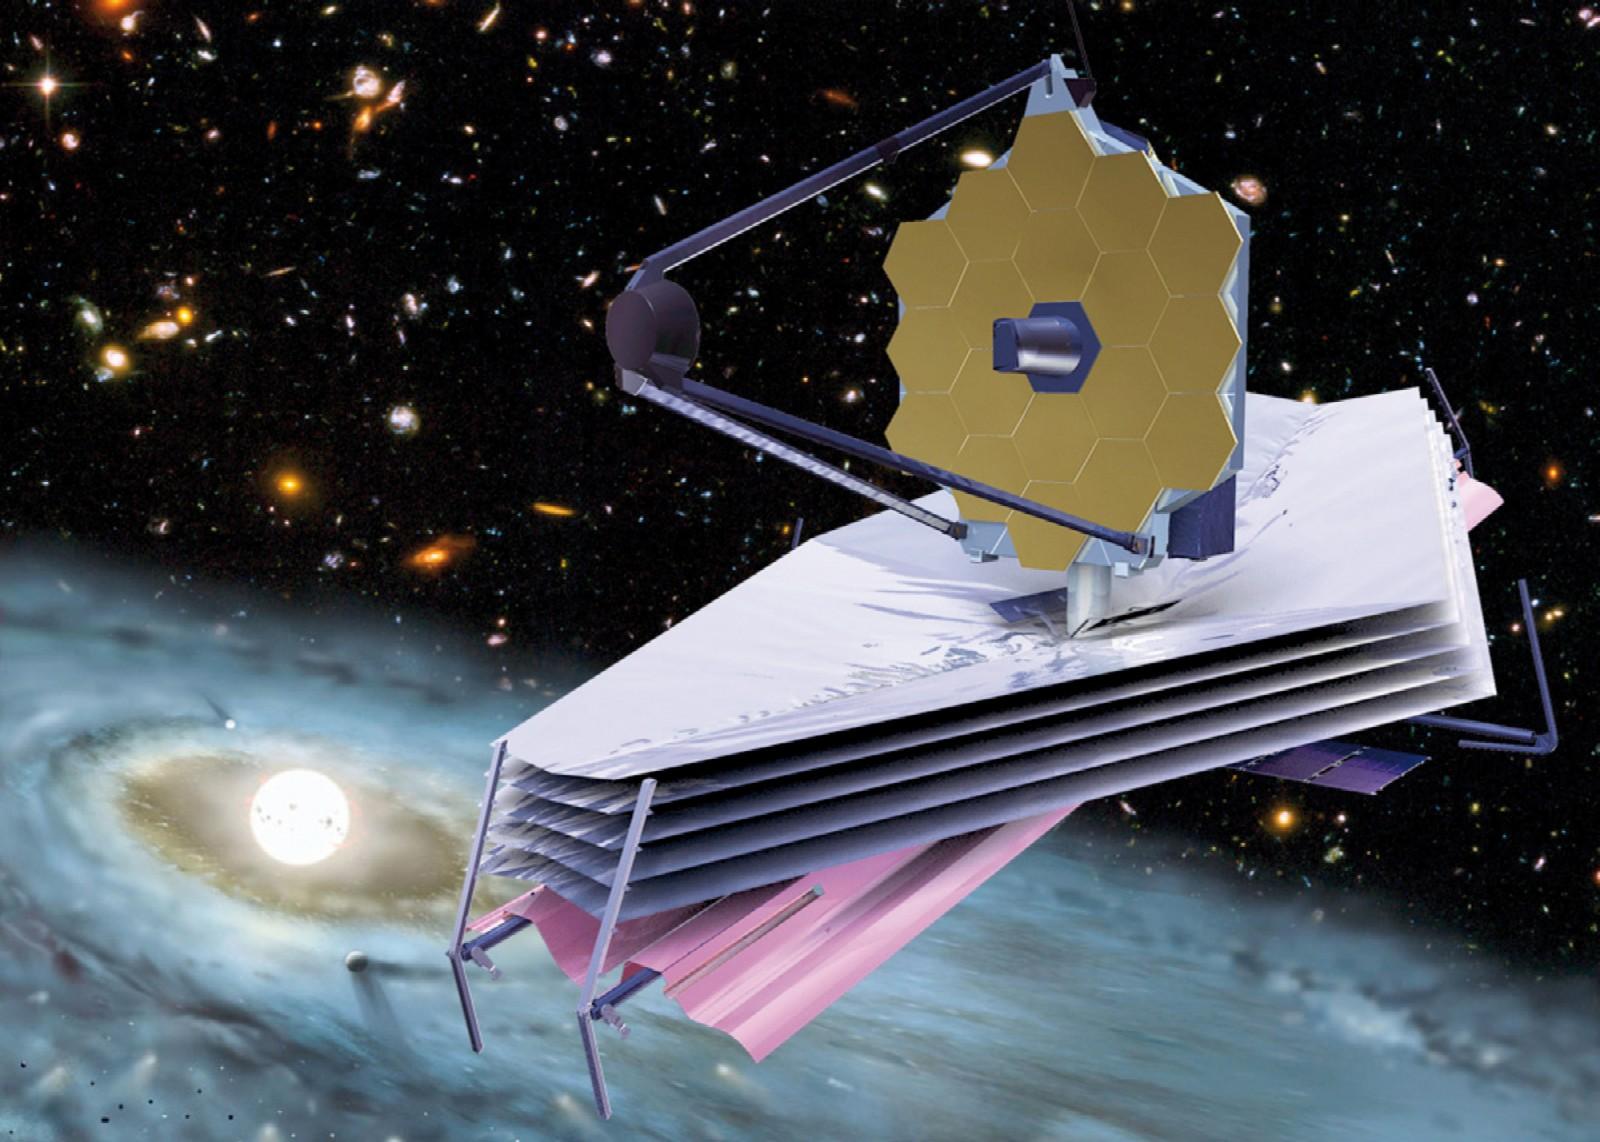 PEGASUS: JWST - James Webb Space Telescope